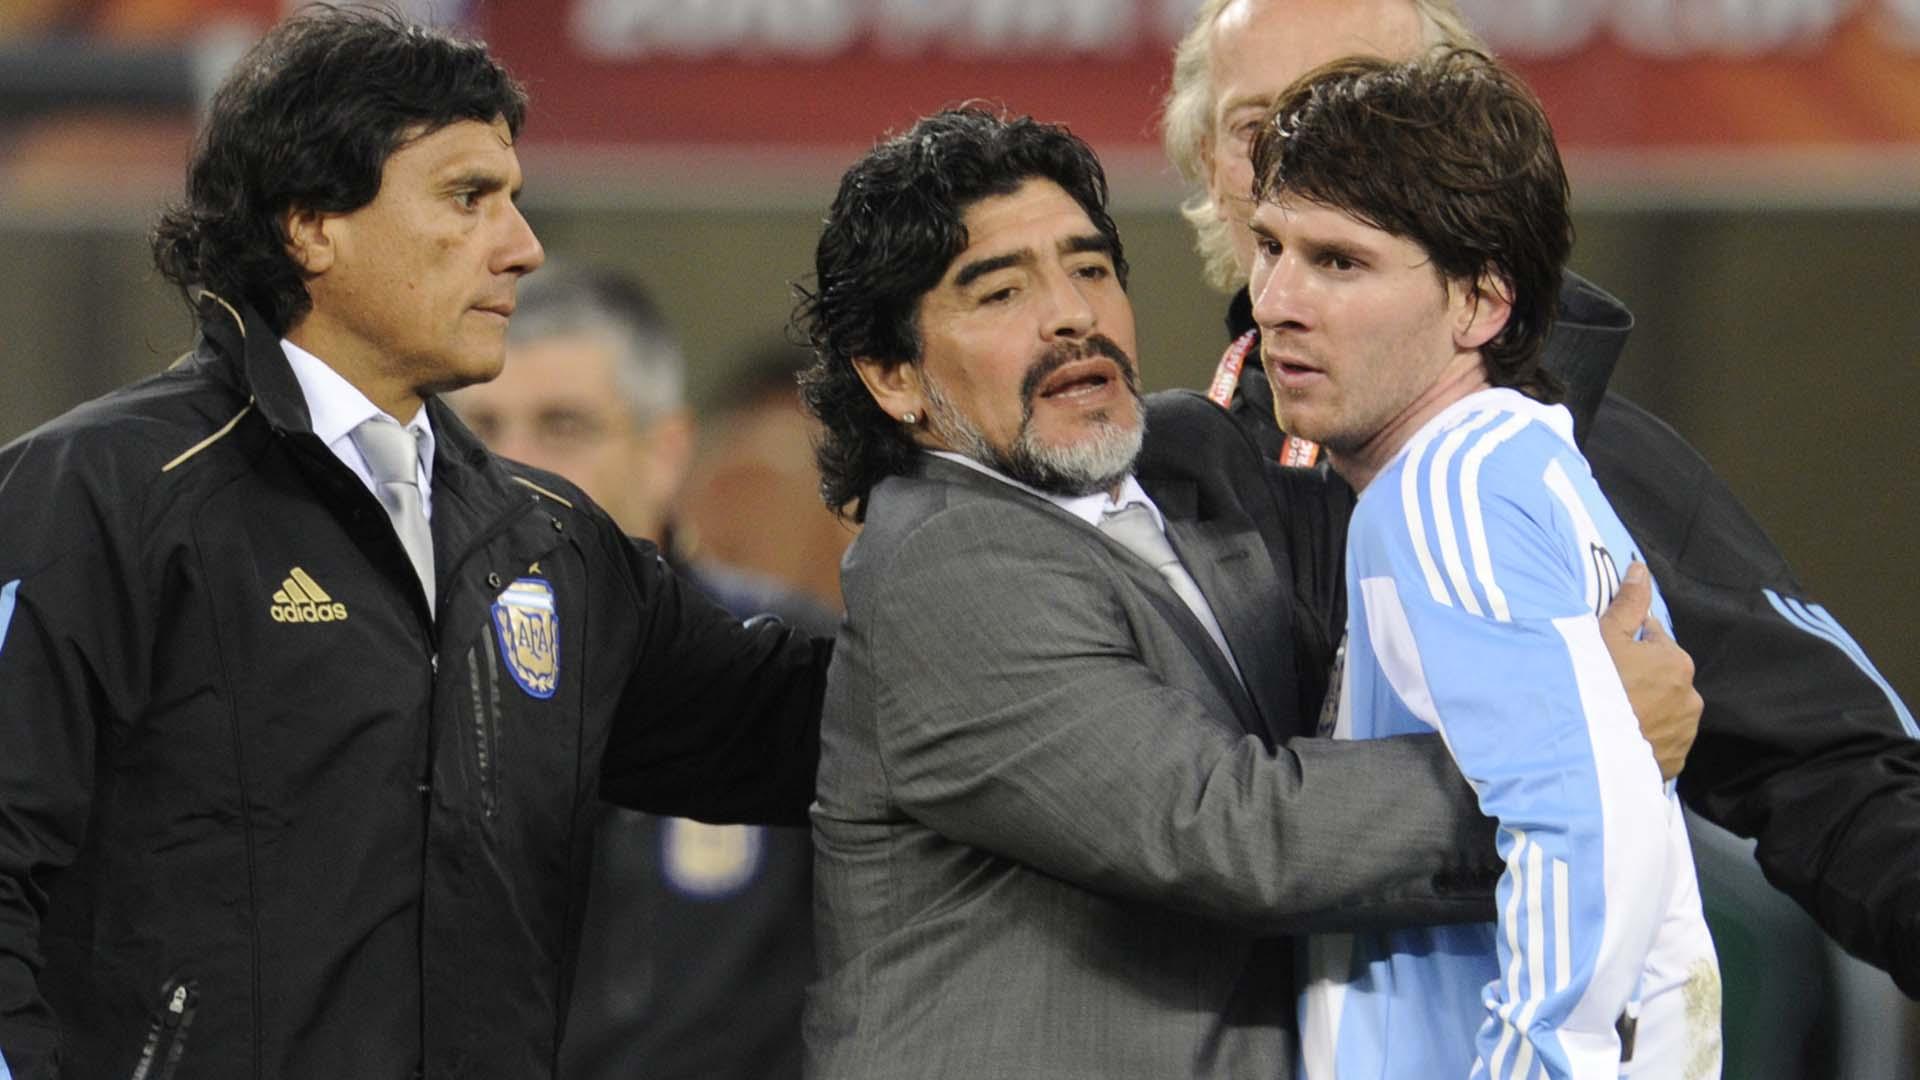 Maradona Messi Sudáfrica 2010 07072015